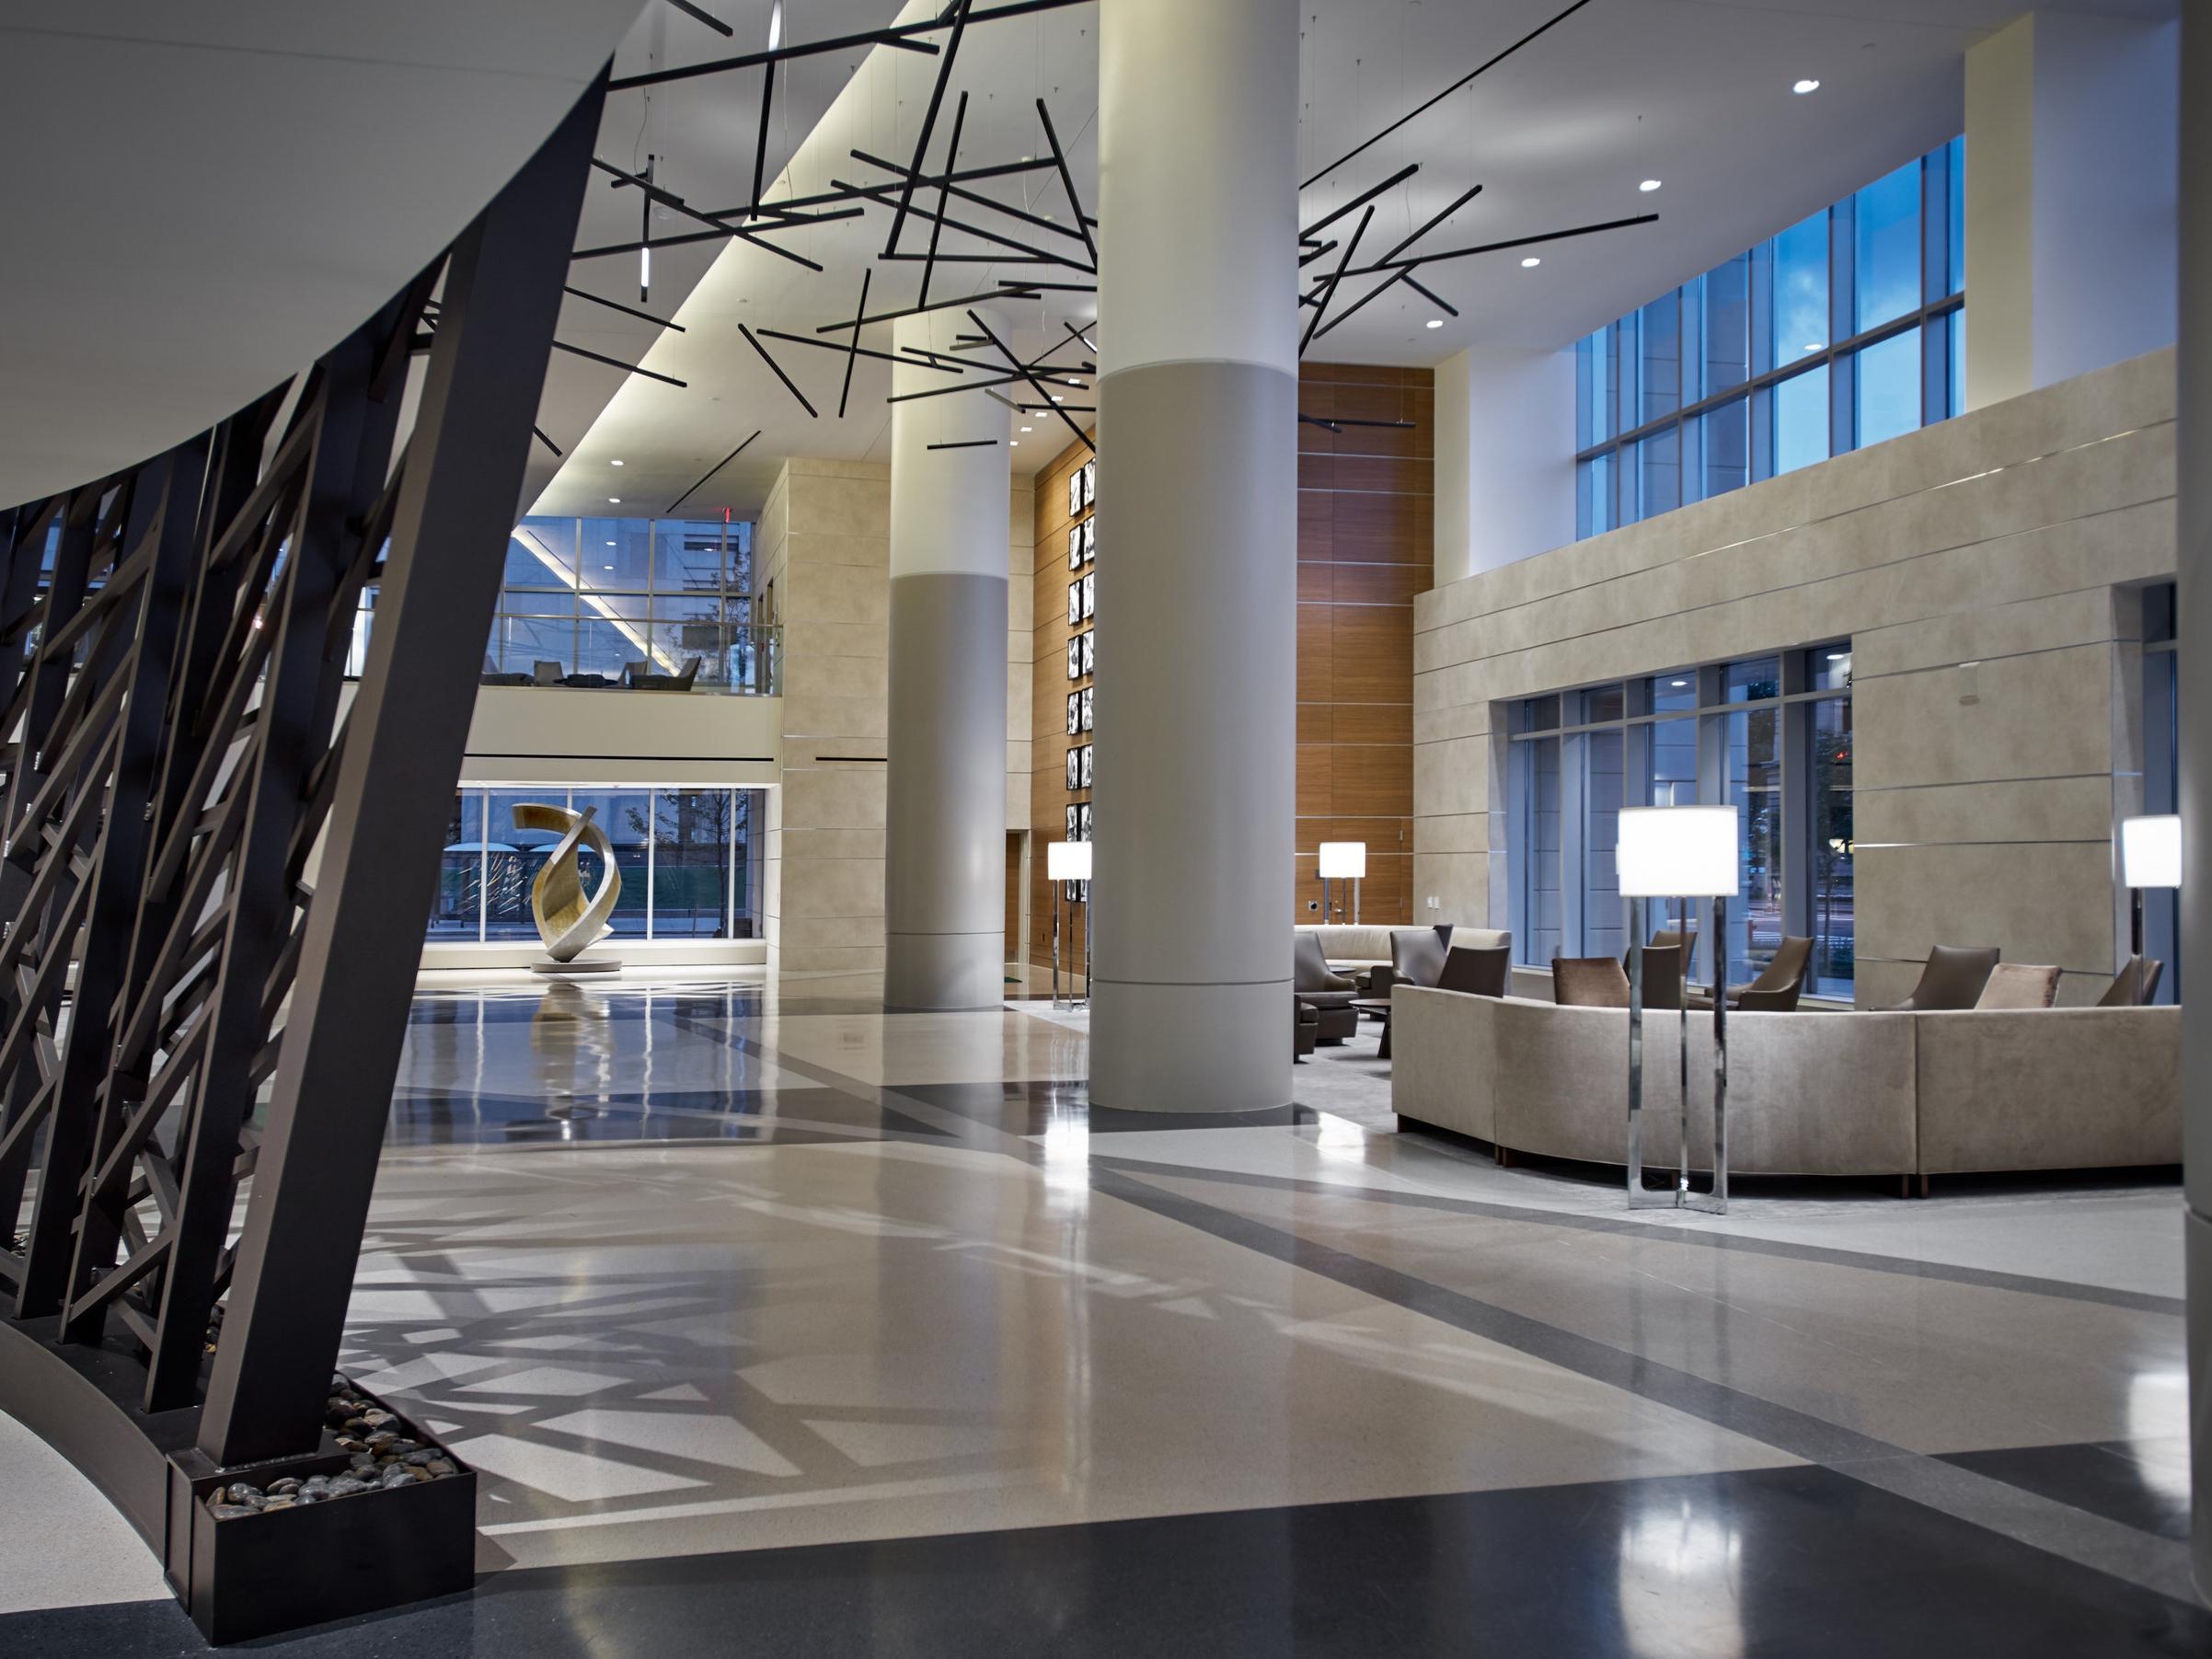 Hilton Cleveland Downtown Lobby